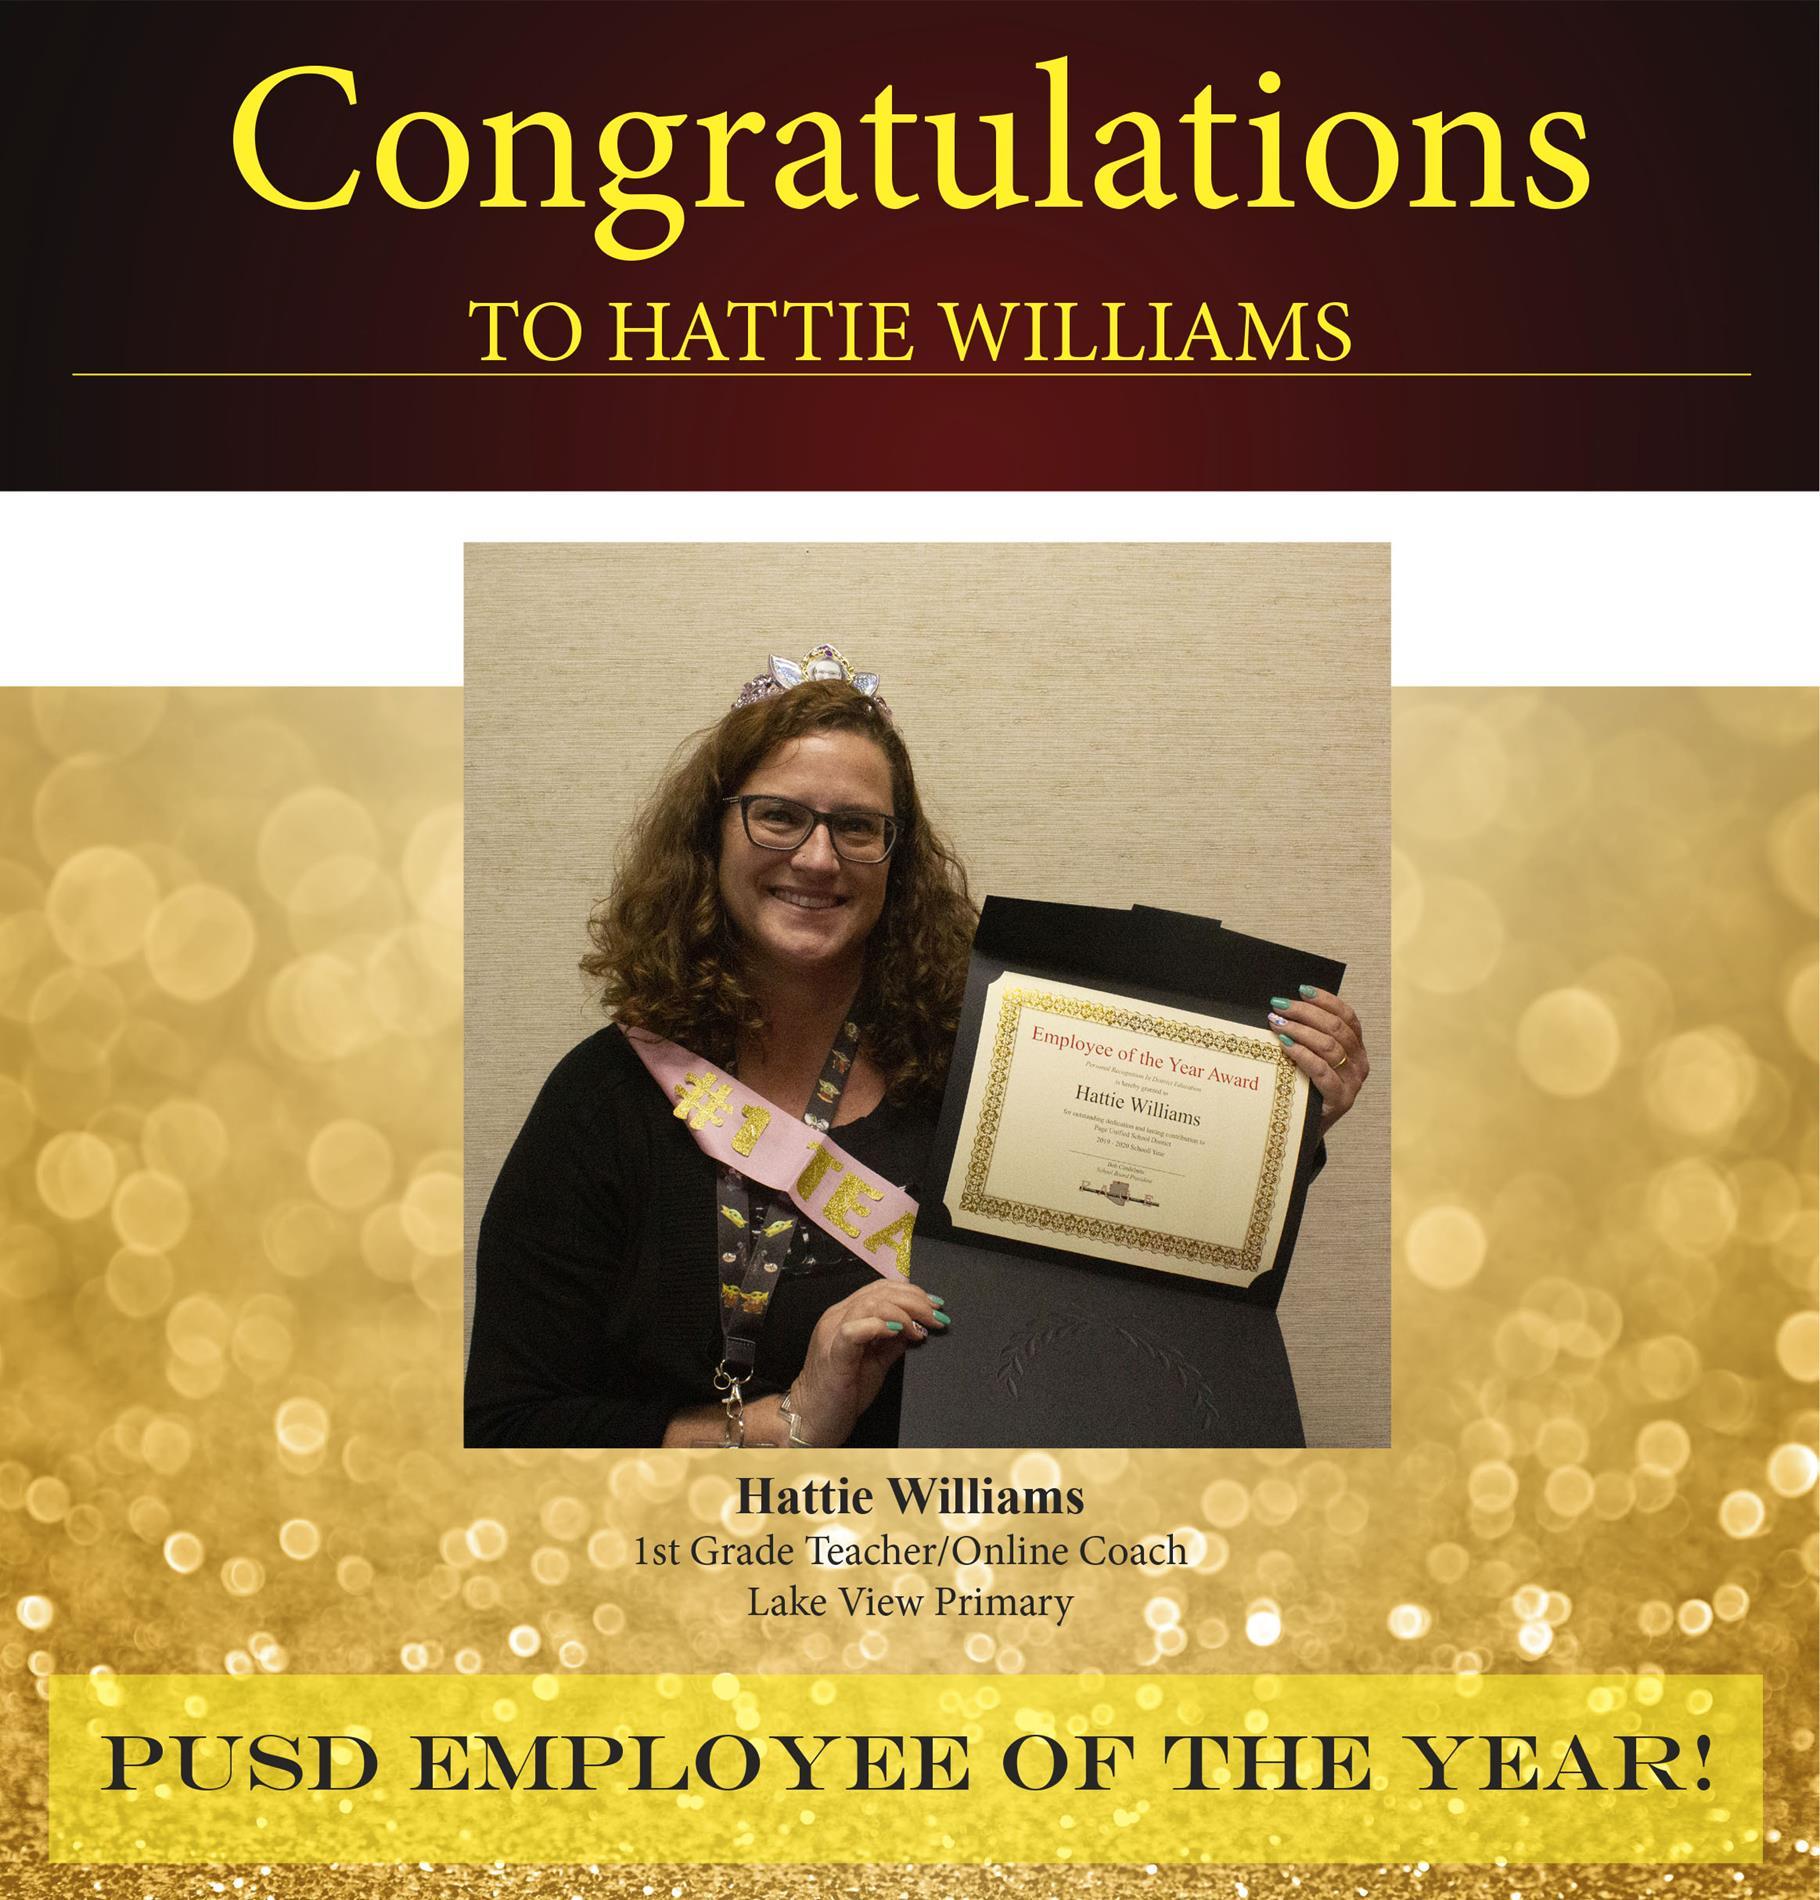 Hattie Wiliams Employee of the Year